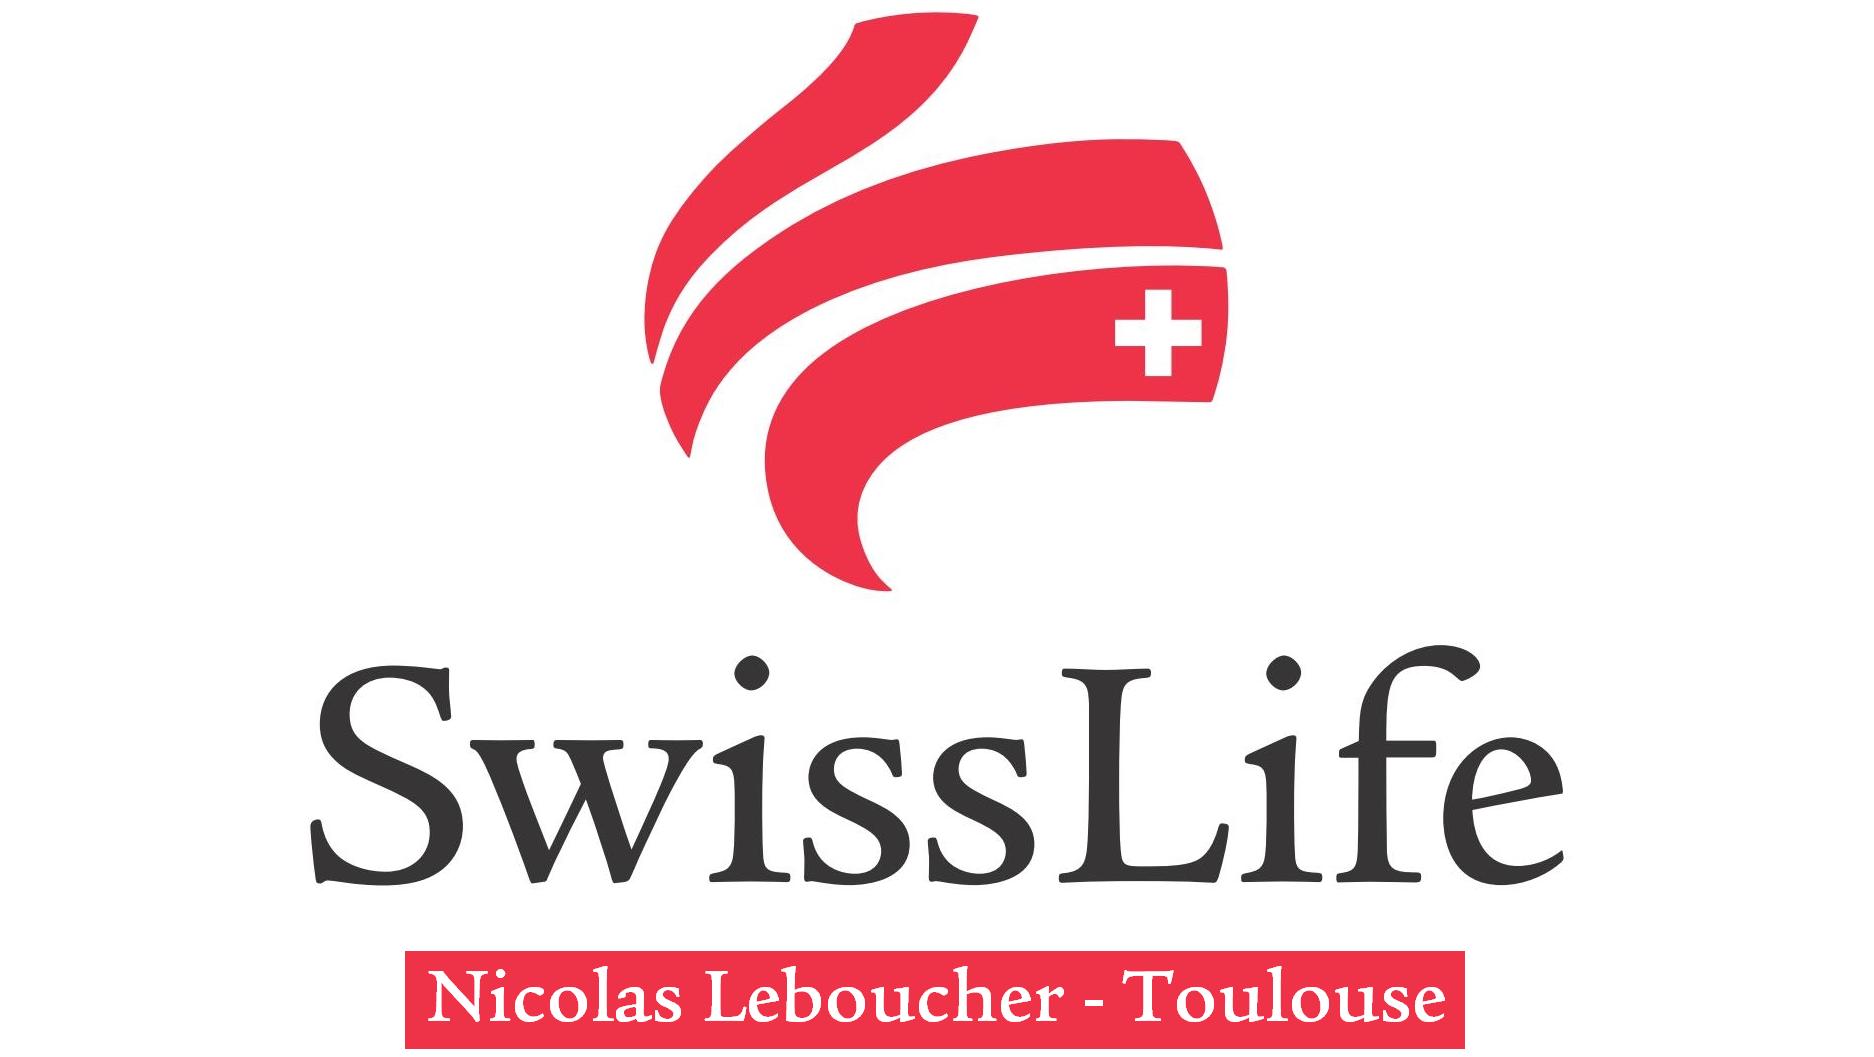 Agence Nicolas Leboucher